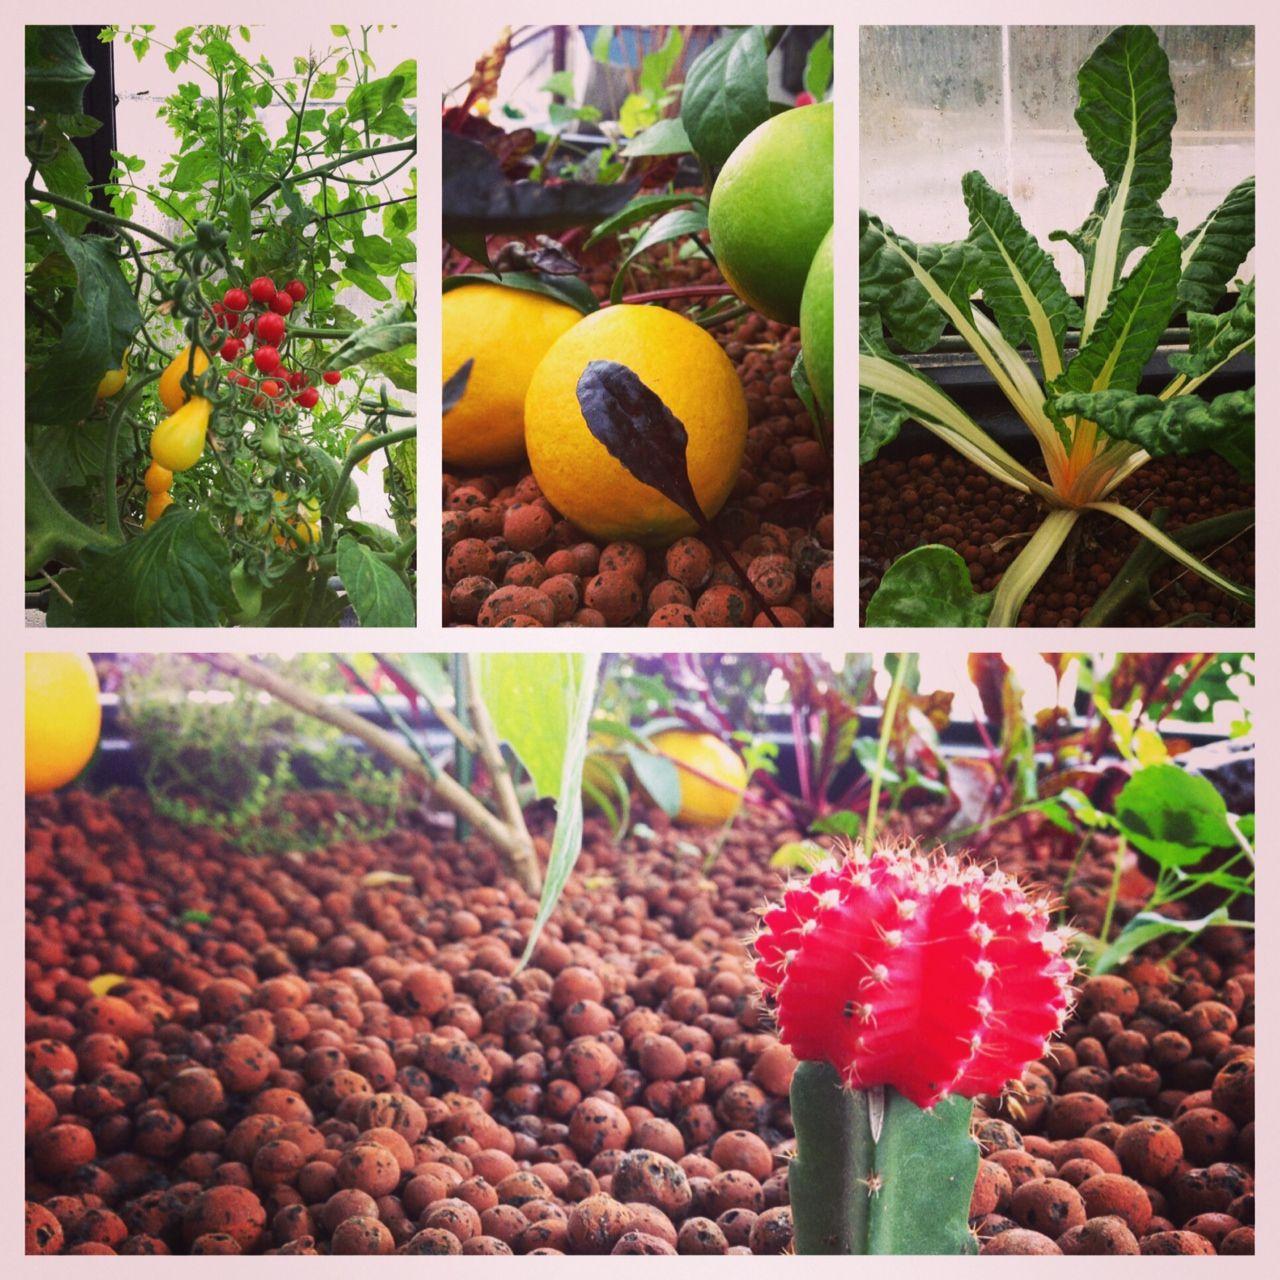 #aquaponics #gardening #aquaponic #cactus #lemon #tomato #organic #growing #garden #hydroponic #aquaculture